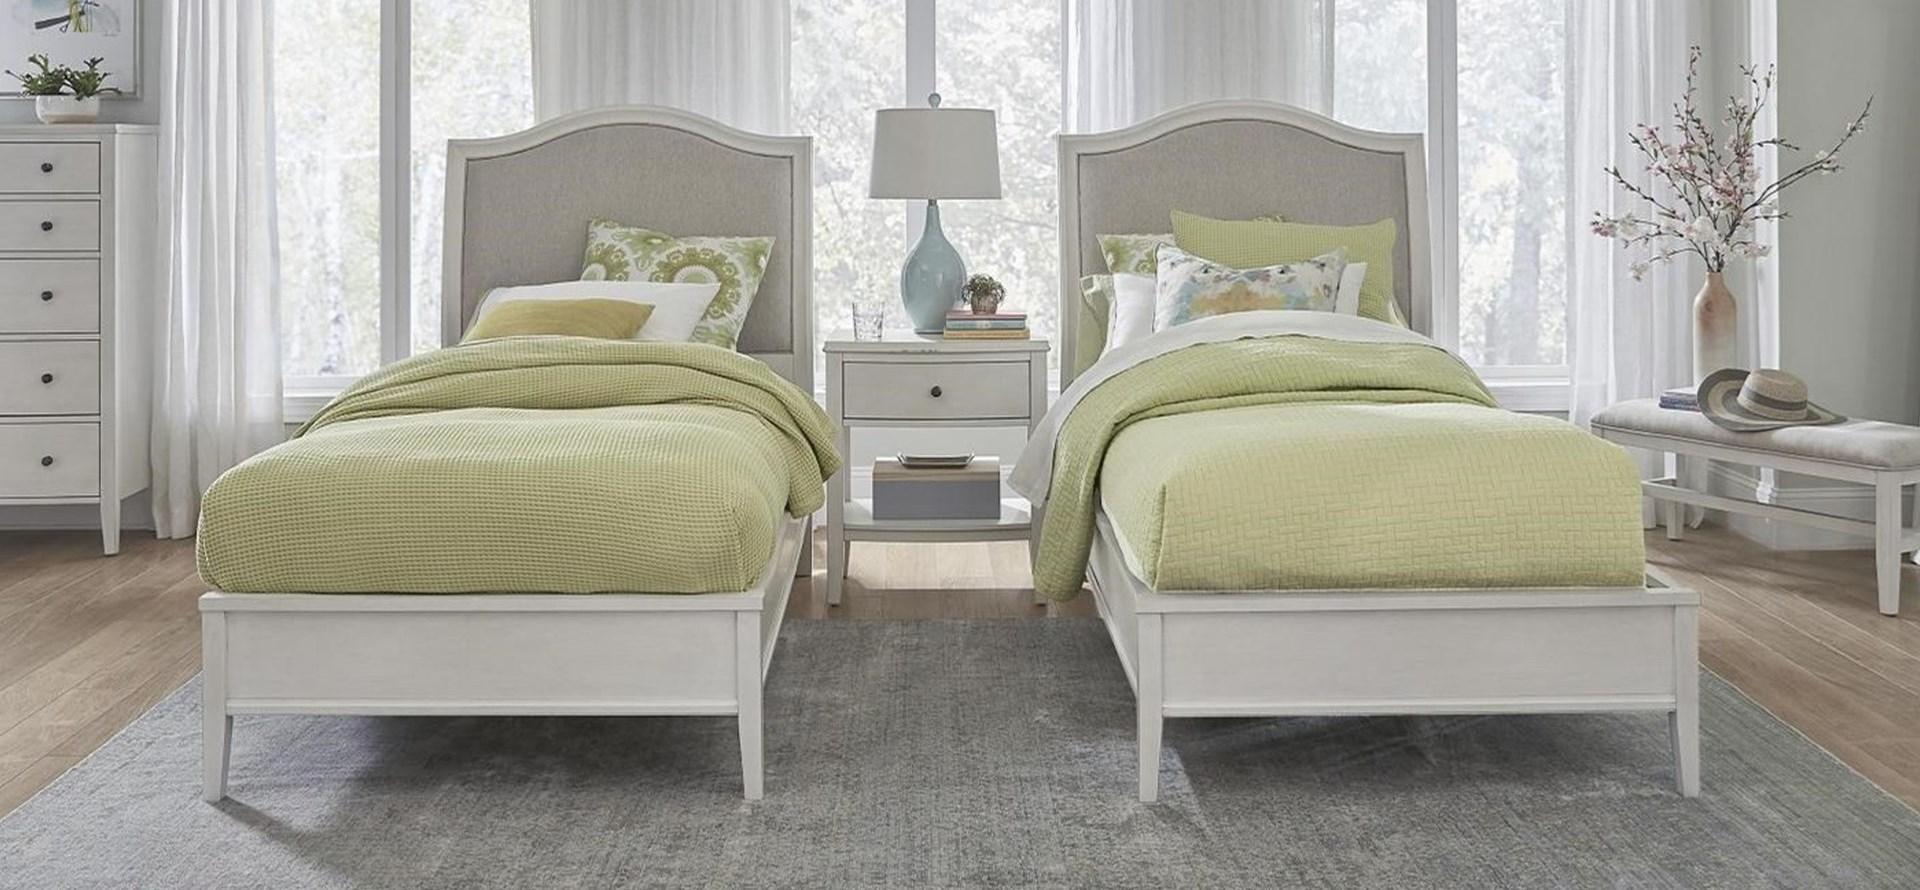 Charlotte Kids Bedroom Collection